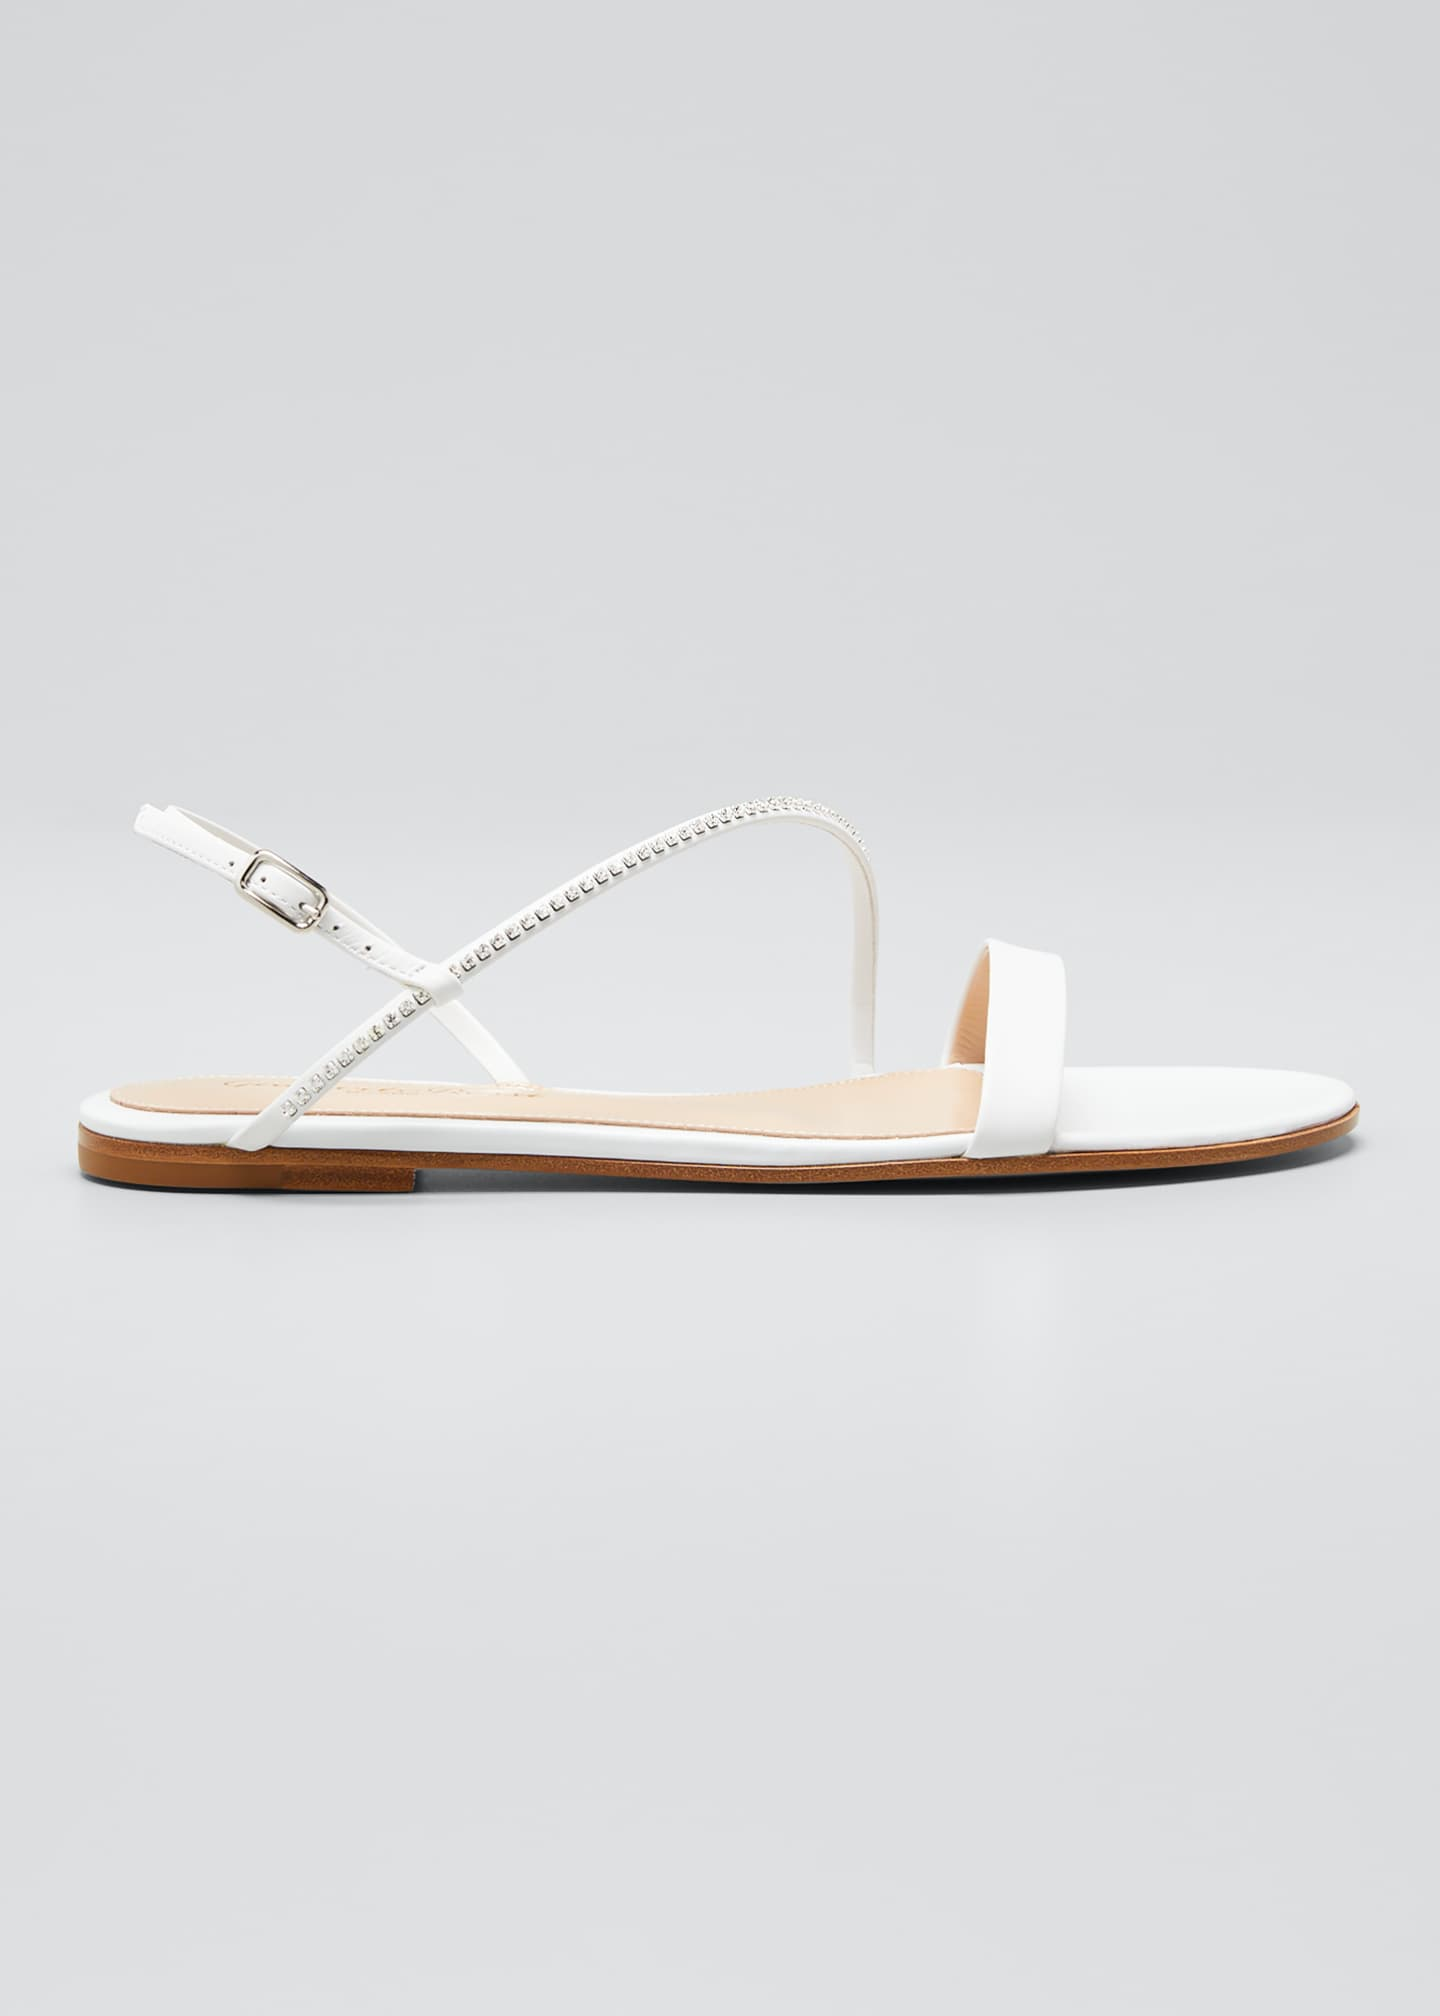 Gianvito Rossi Asymmetric Leather Flat Sandals